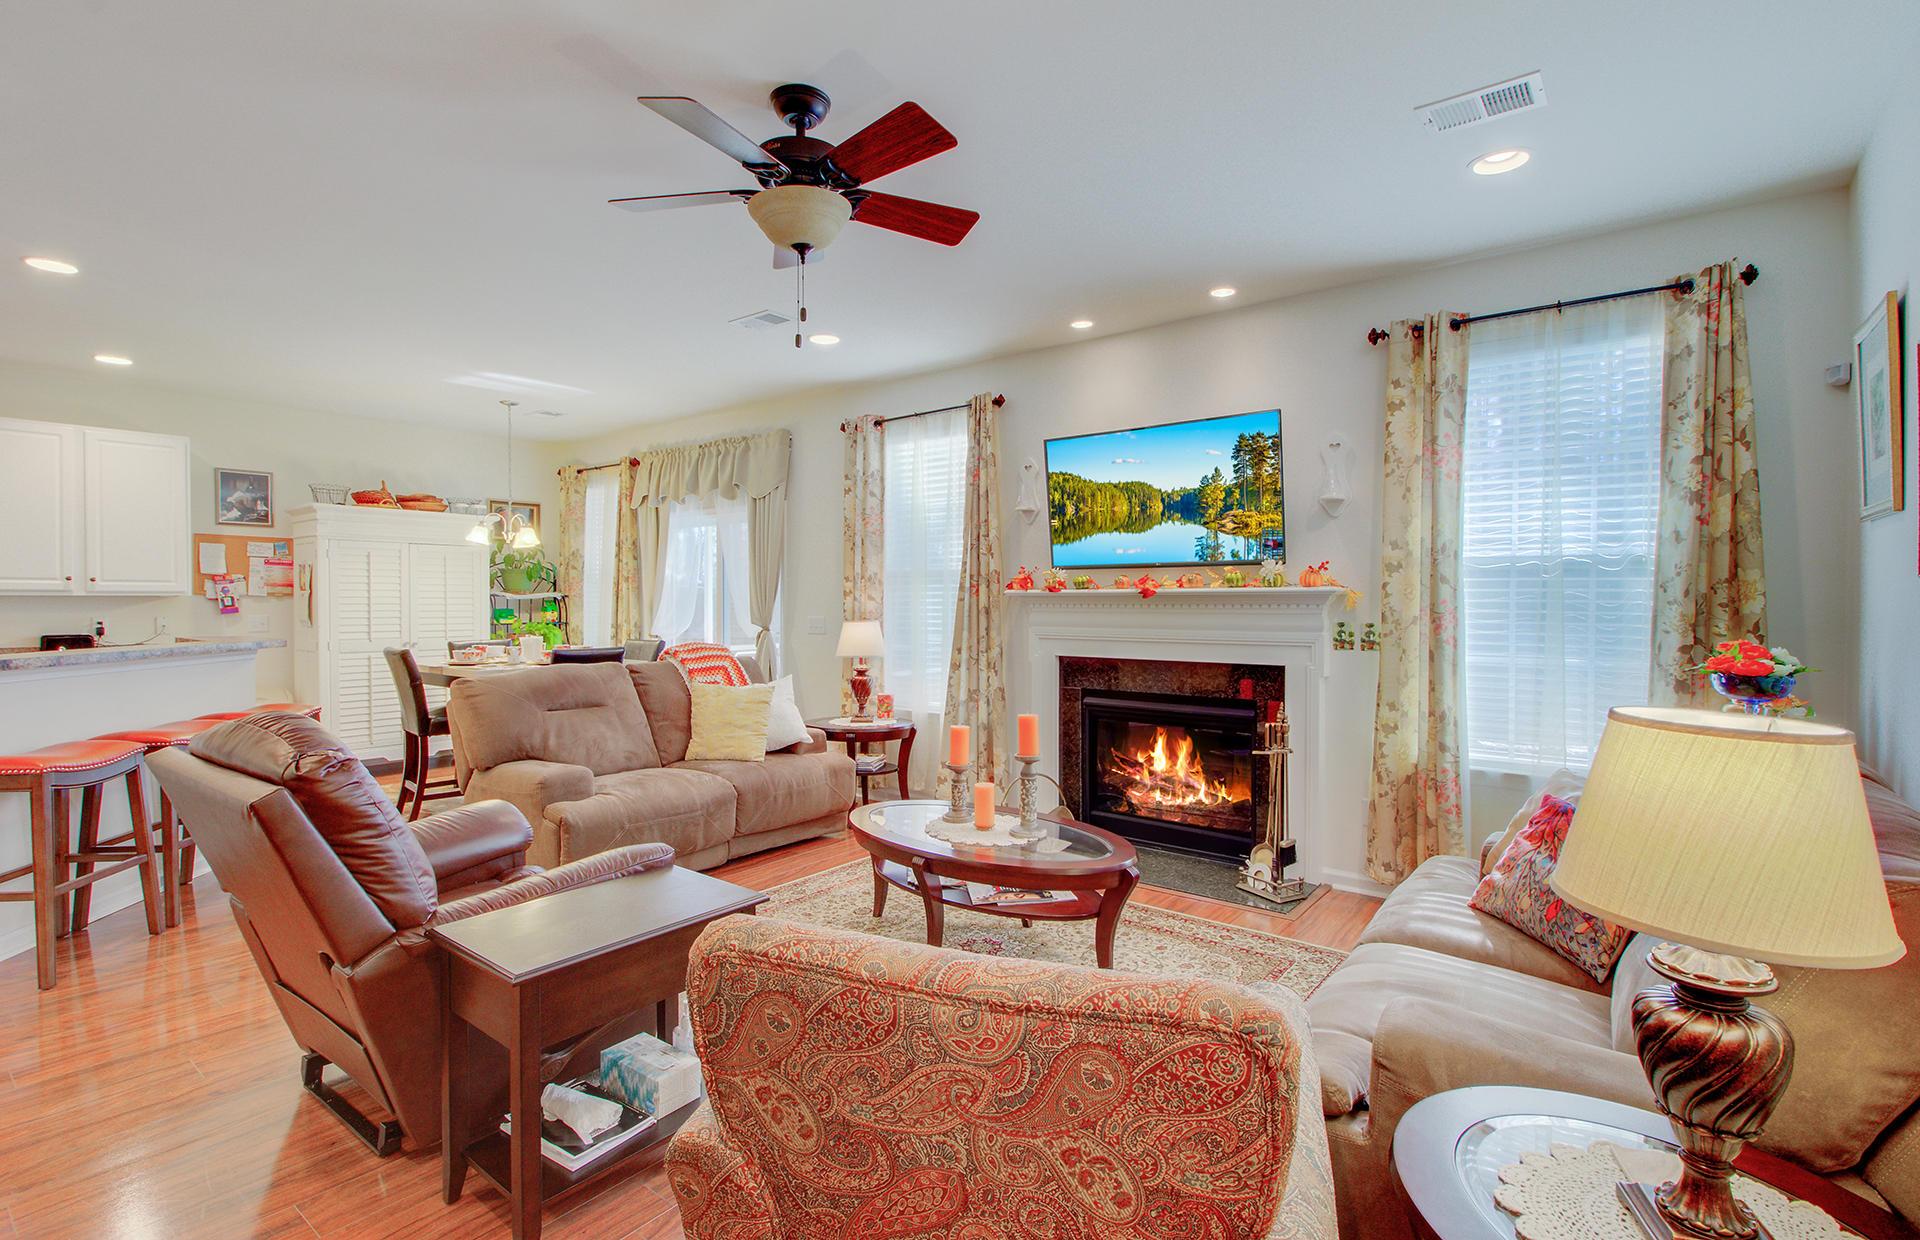 Cane Bay Plantation Homes For Sale - 255 Spectrum, Summerville, SC - 7